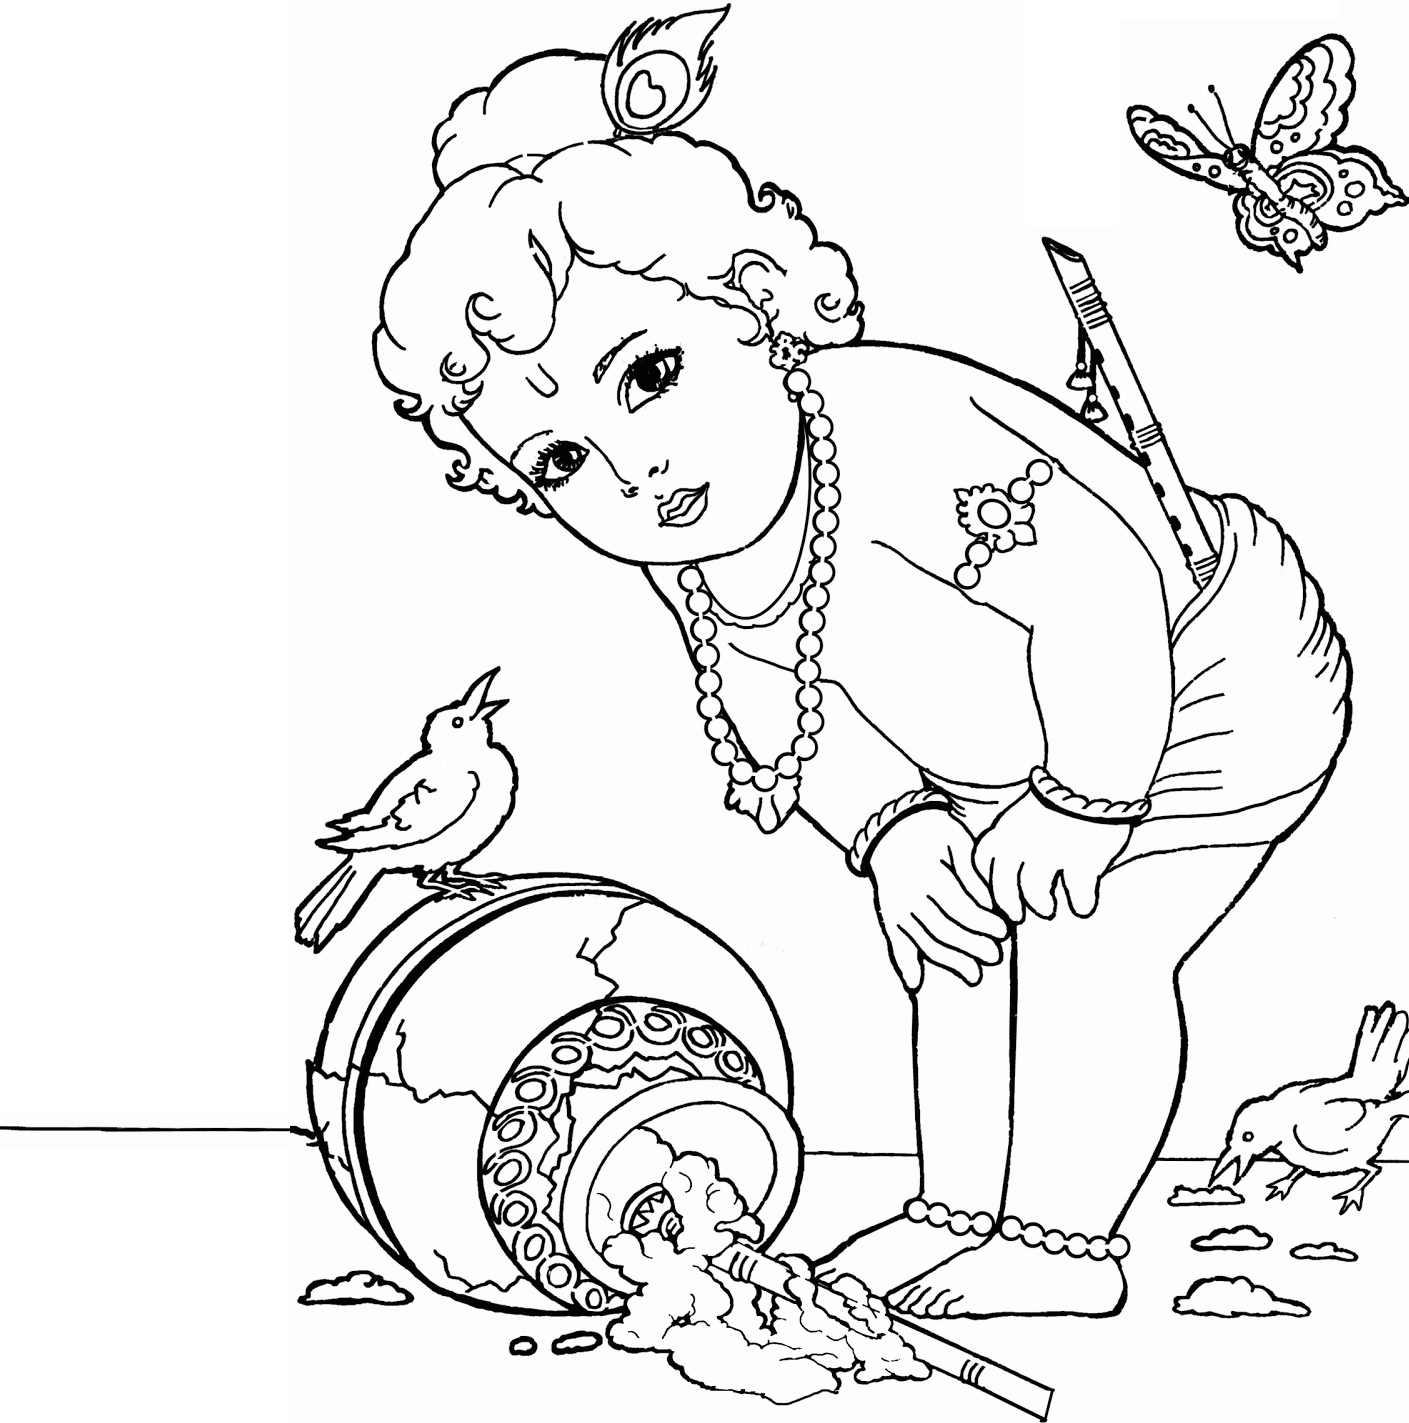 1409x1423 Lord Vishnu Pencil Sketch Images Sitting Pencil Sketch Of Lord